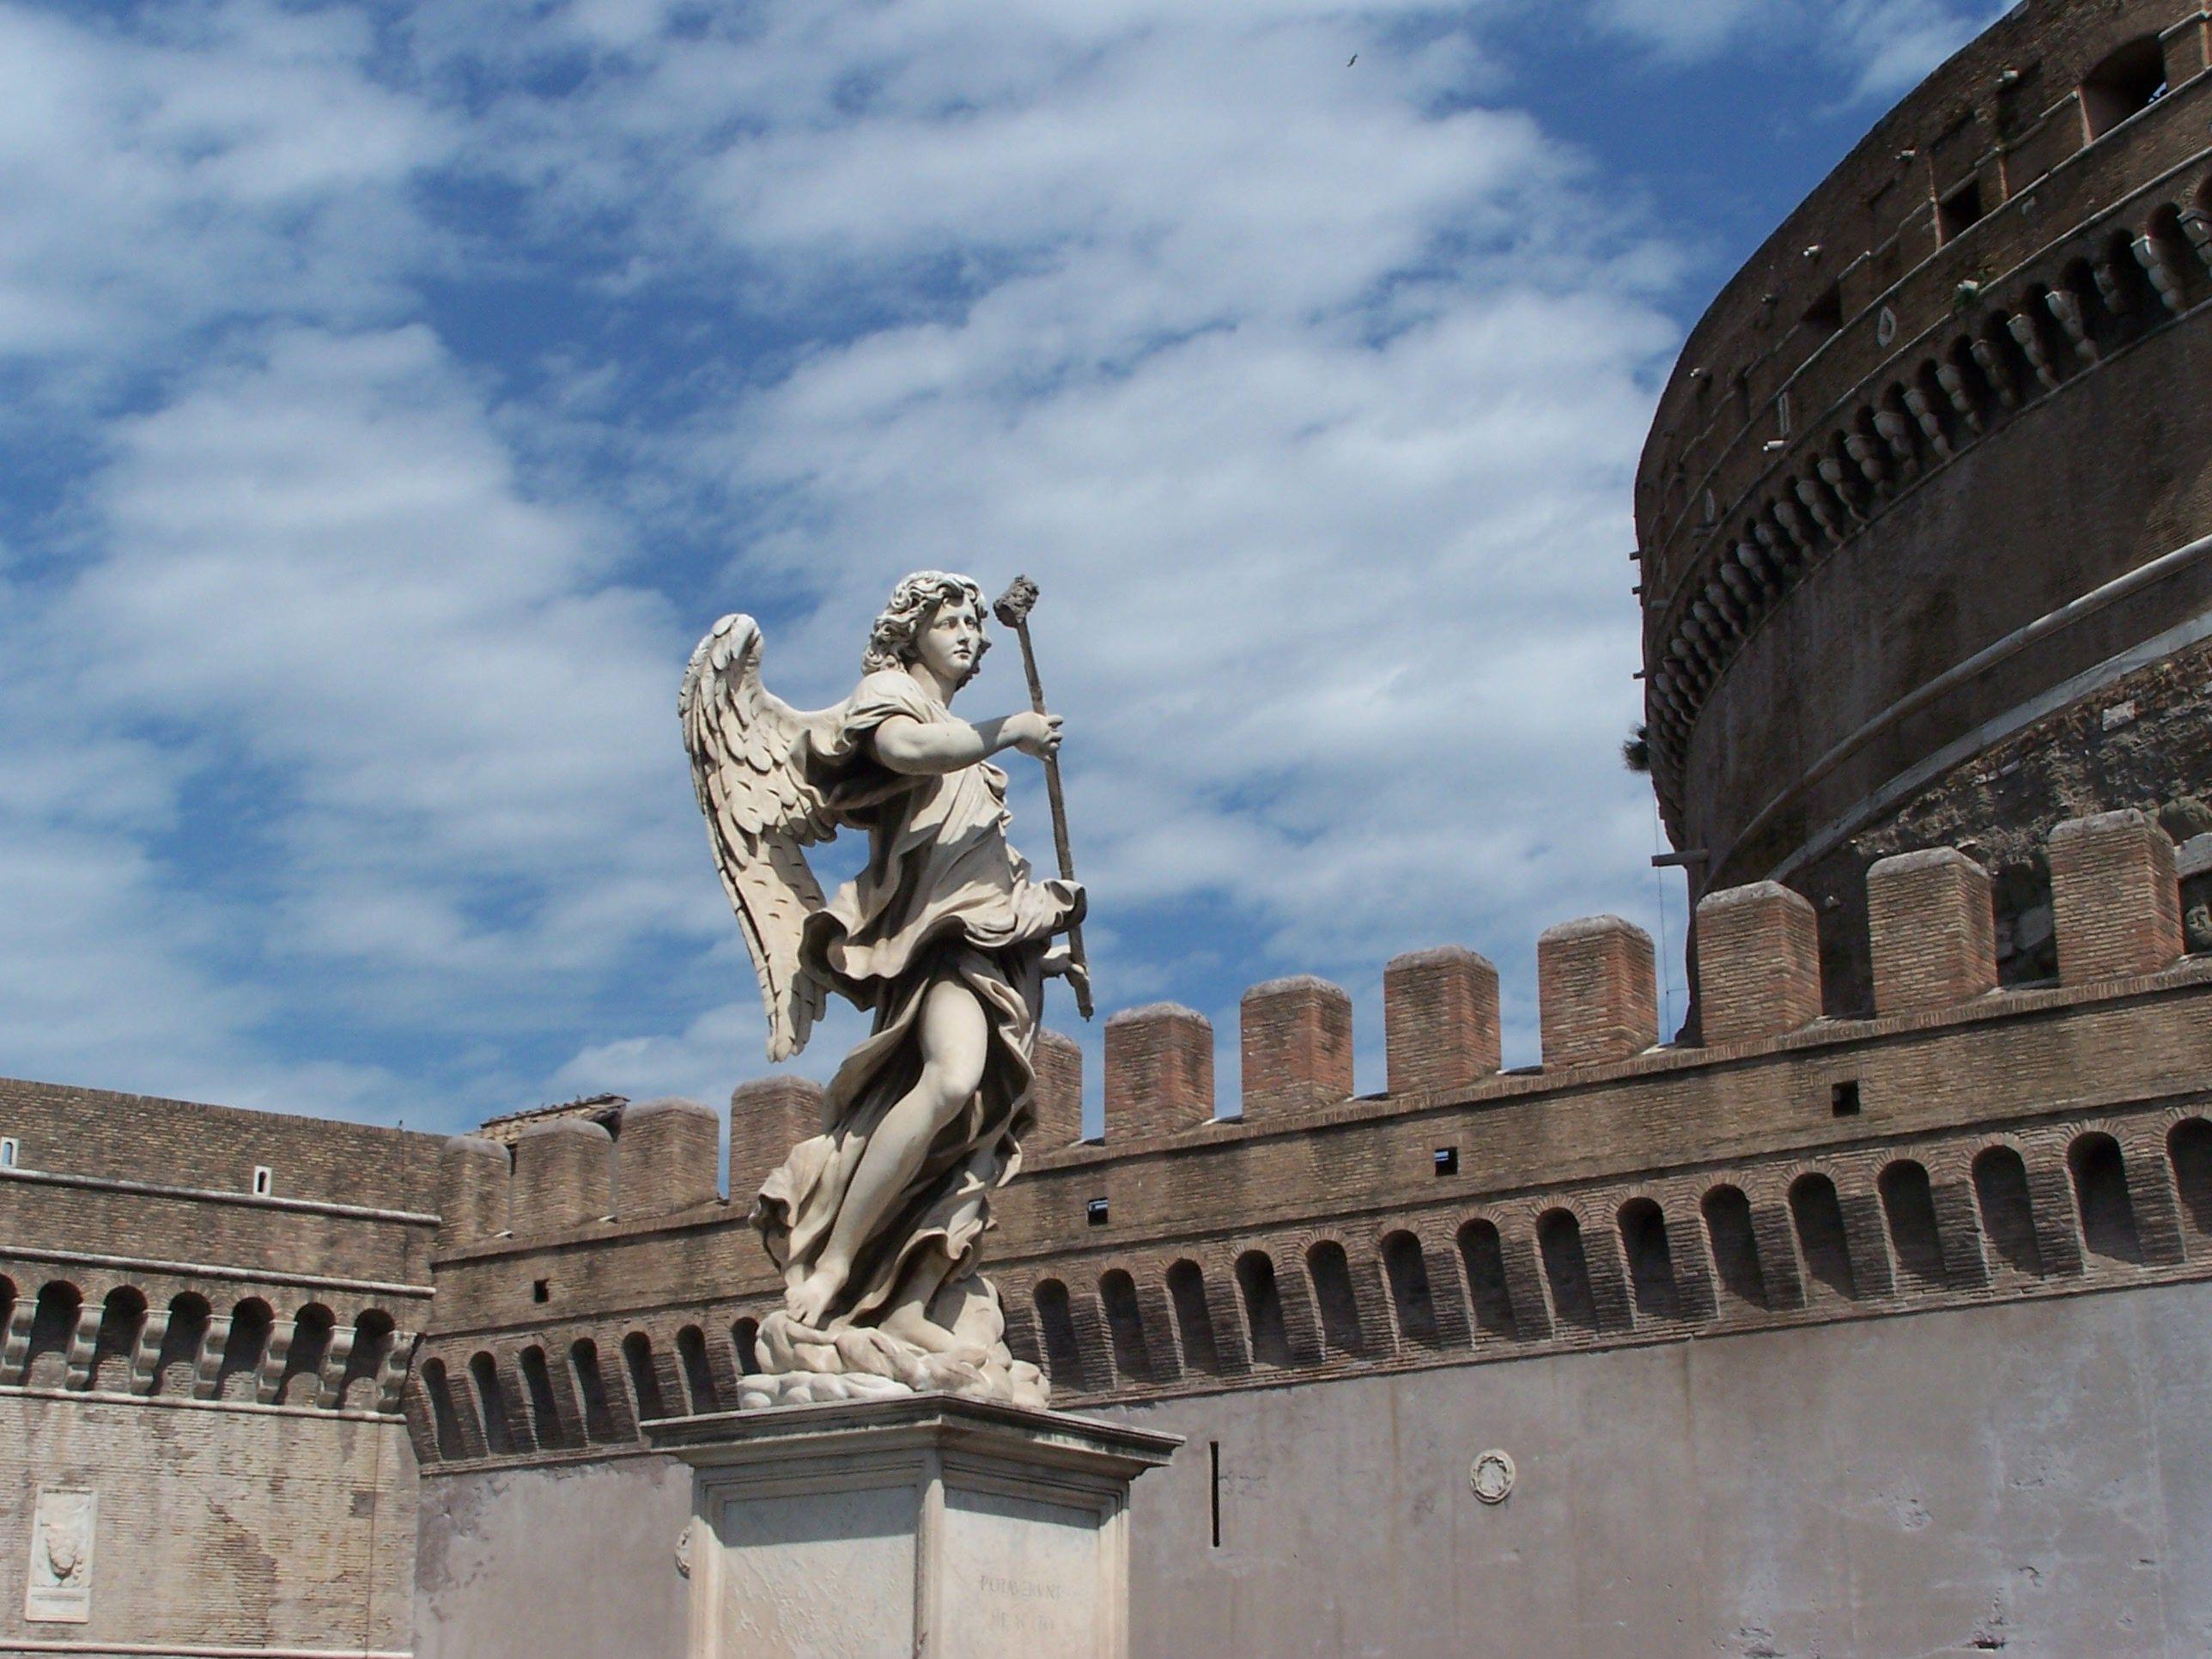 Arcangelo Gabriele scolpito da Gian Lorenzo Bernini, trovasi sul Ponte Sant'Angelo.